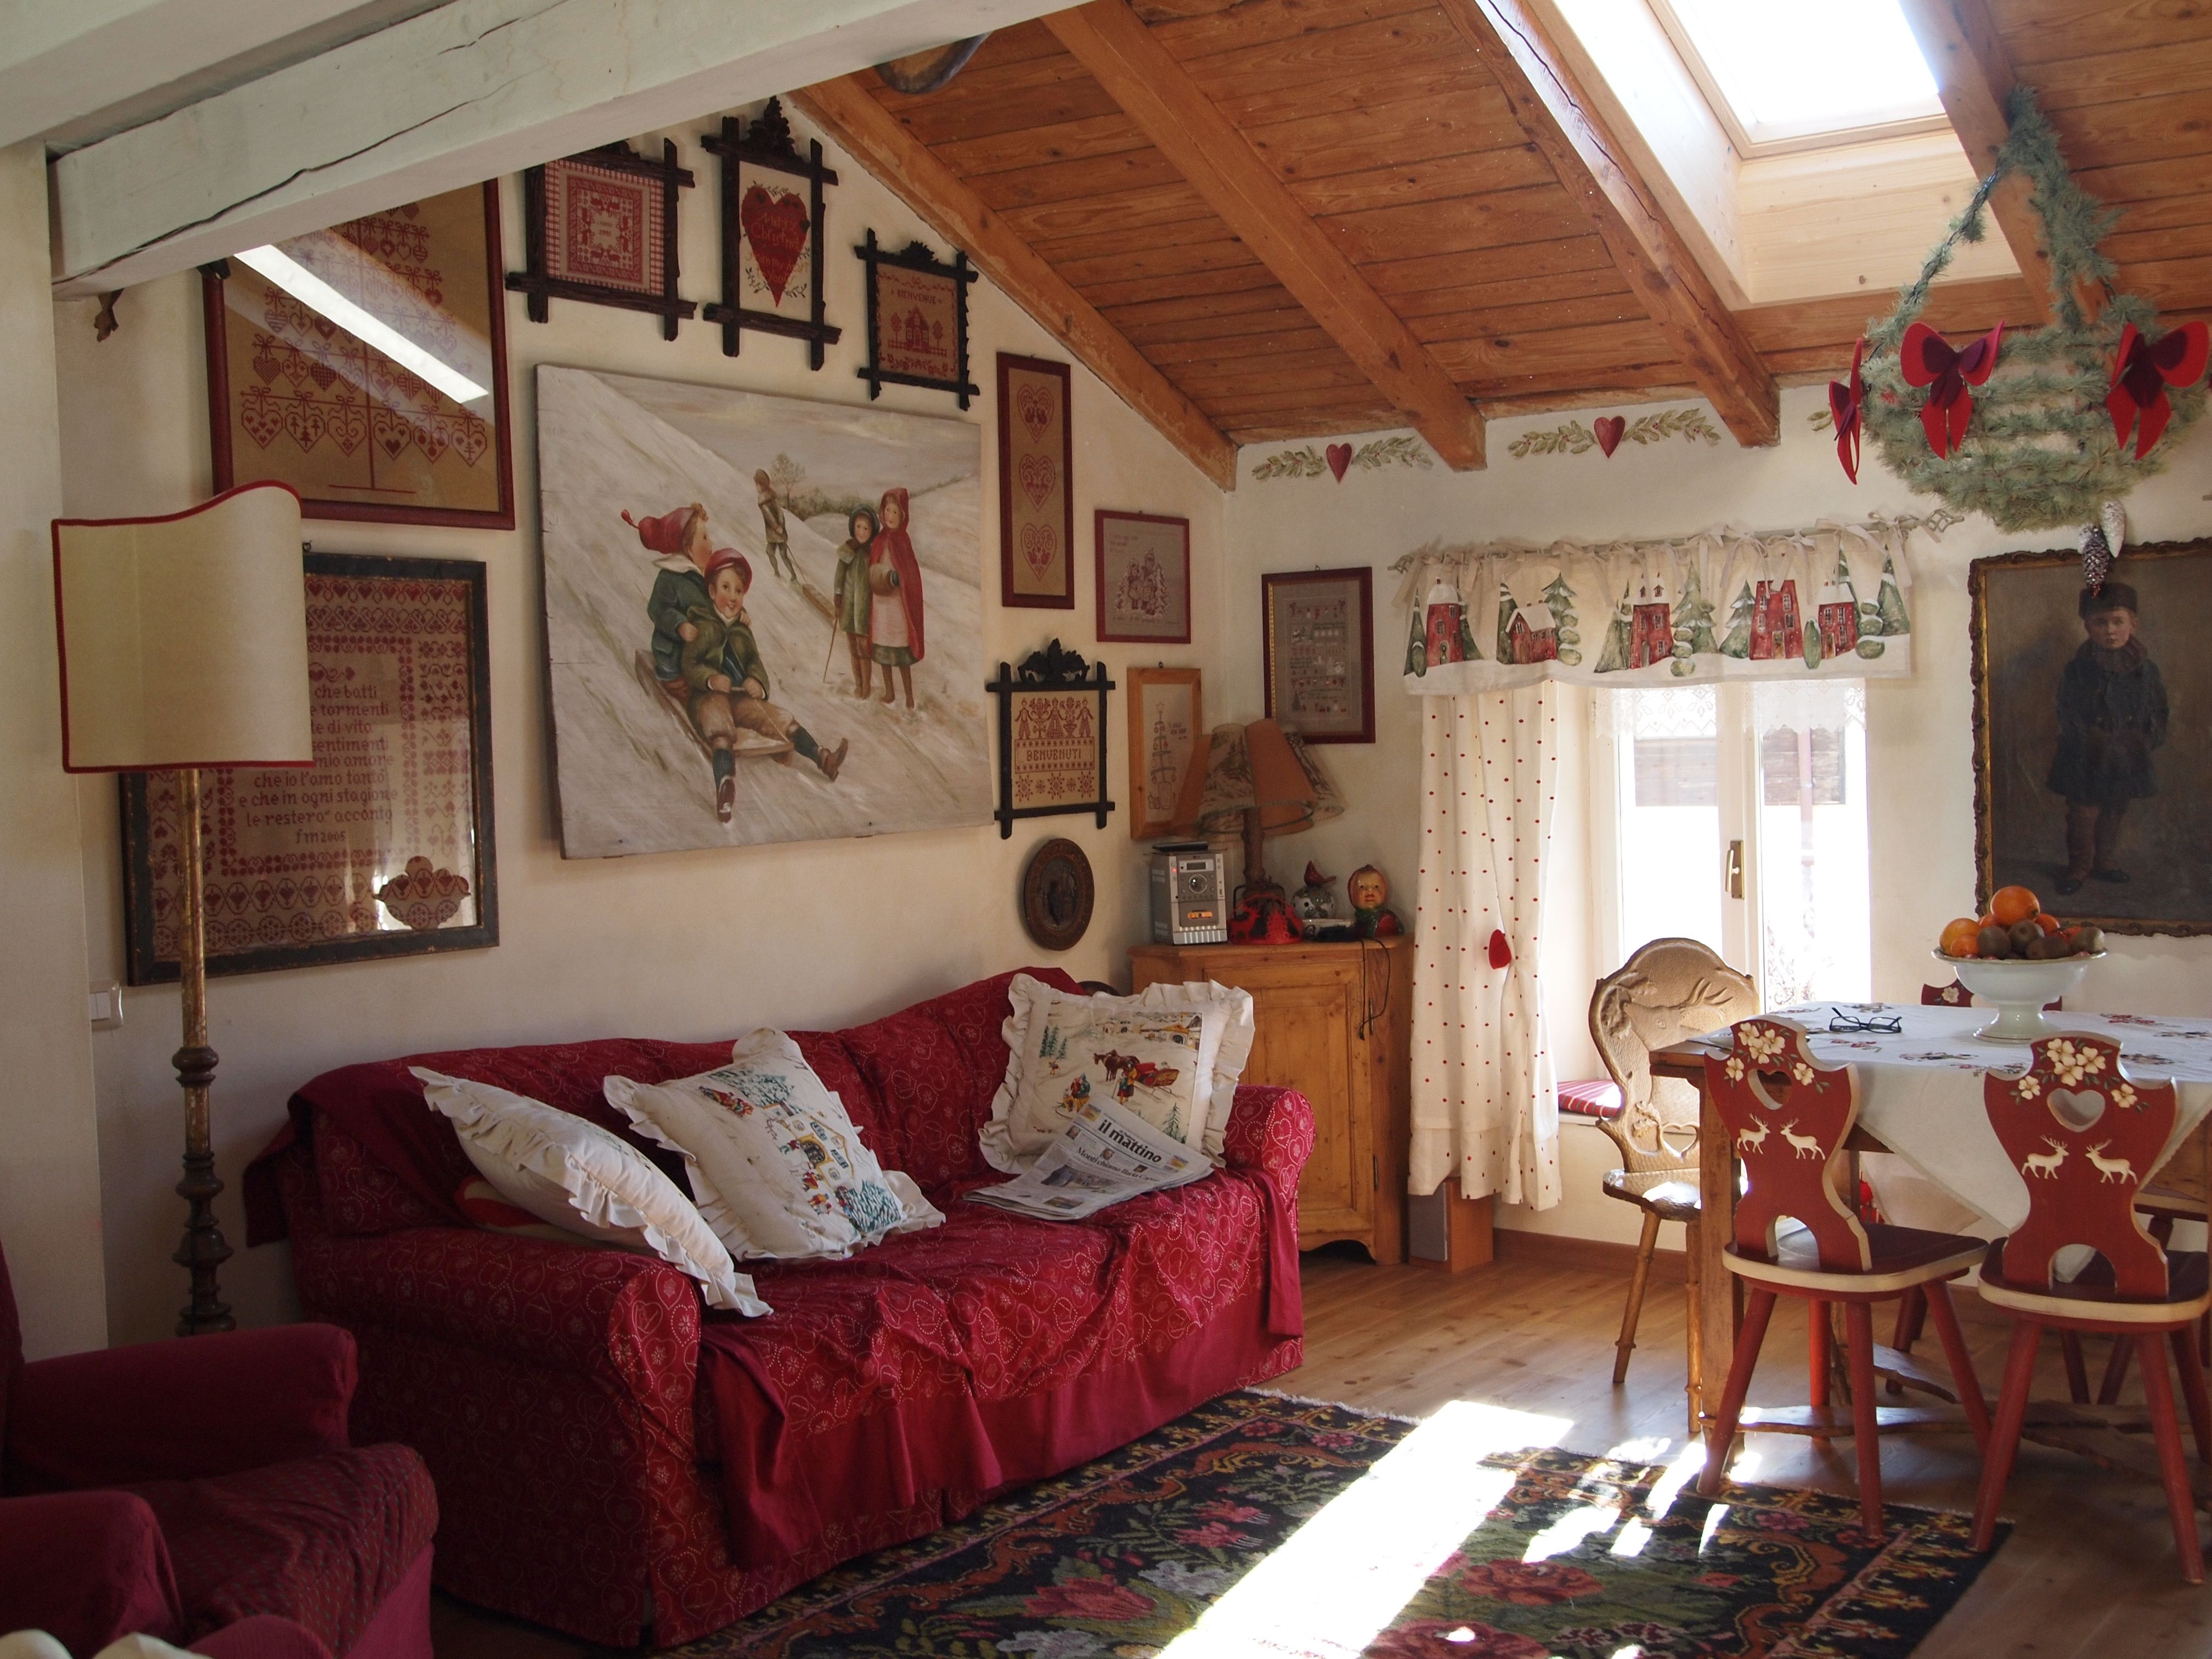 Arredo interno casa di montagna homesweethome pinterest interiors - Casa montagna arredo ...